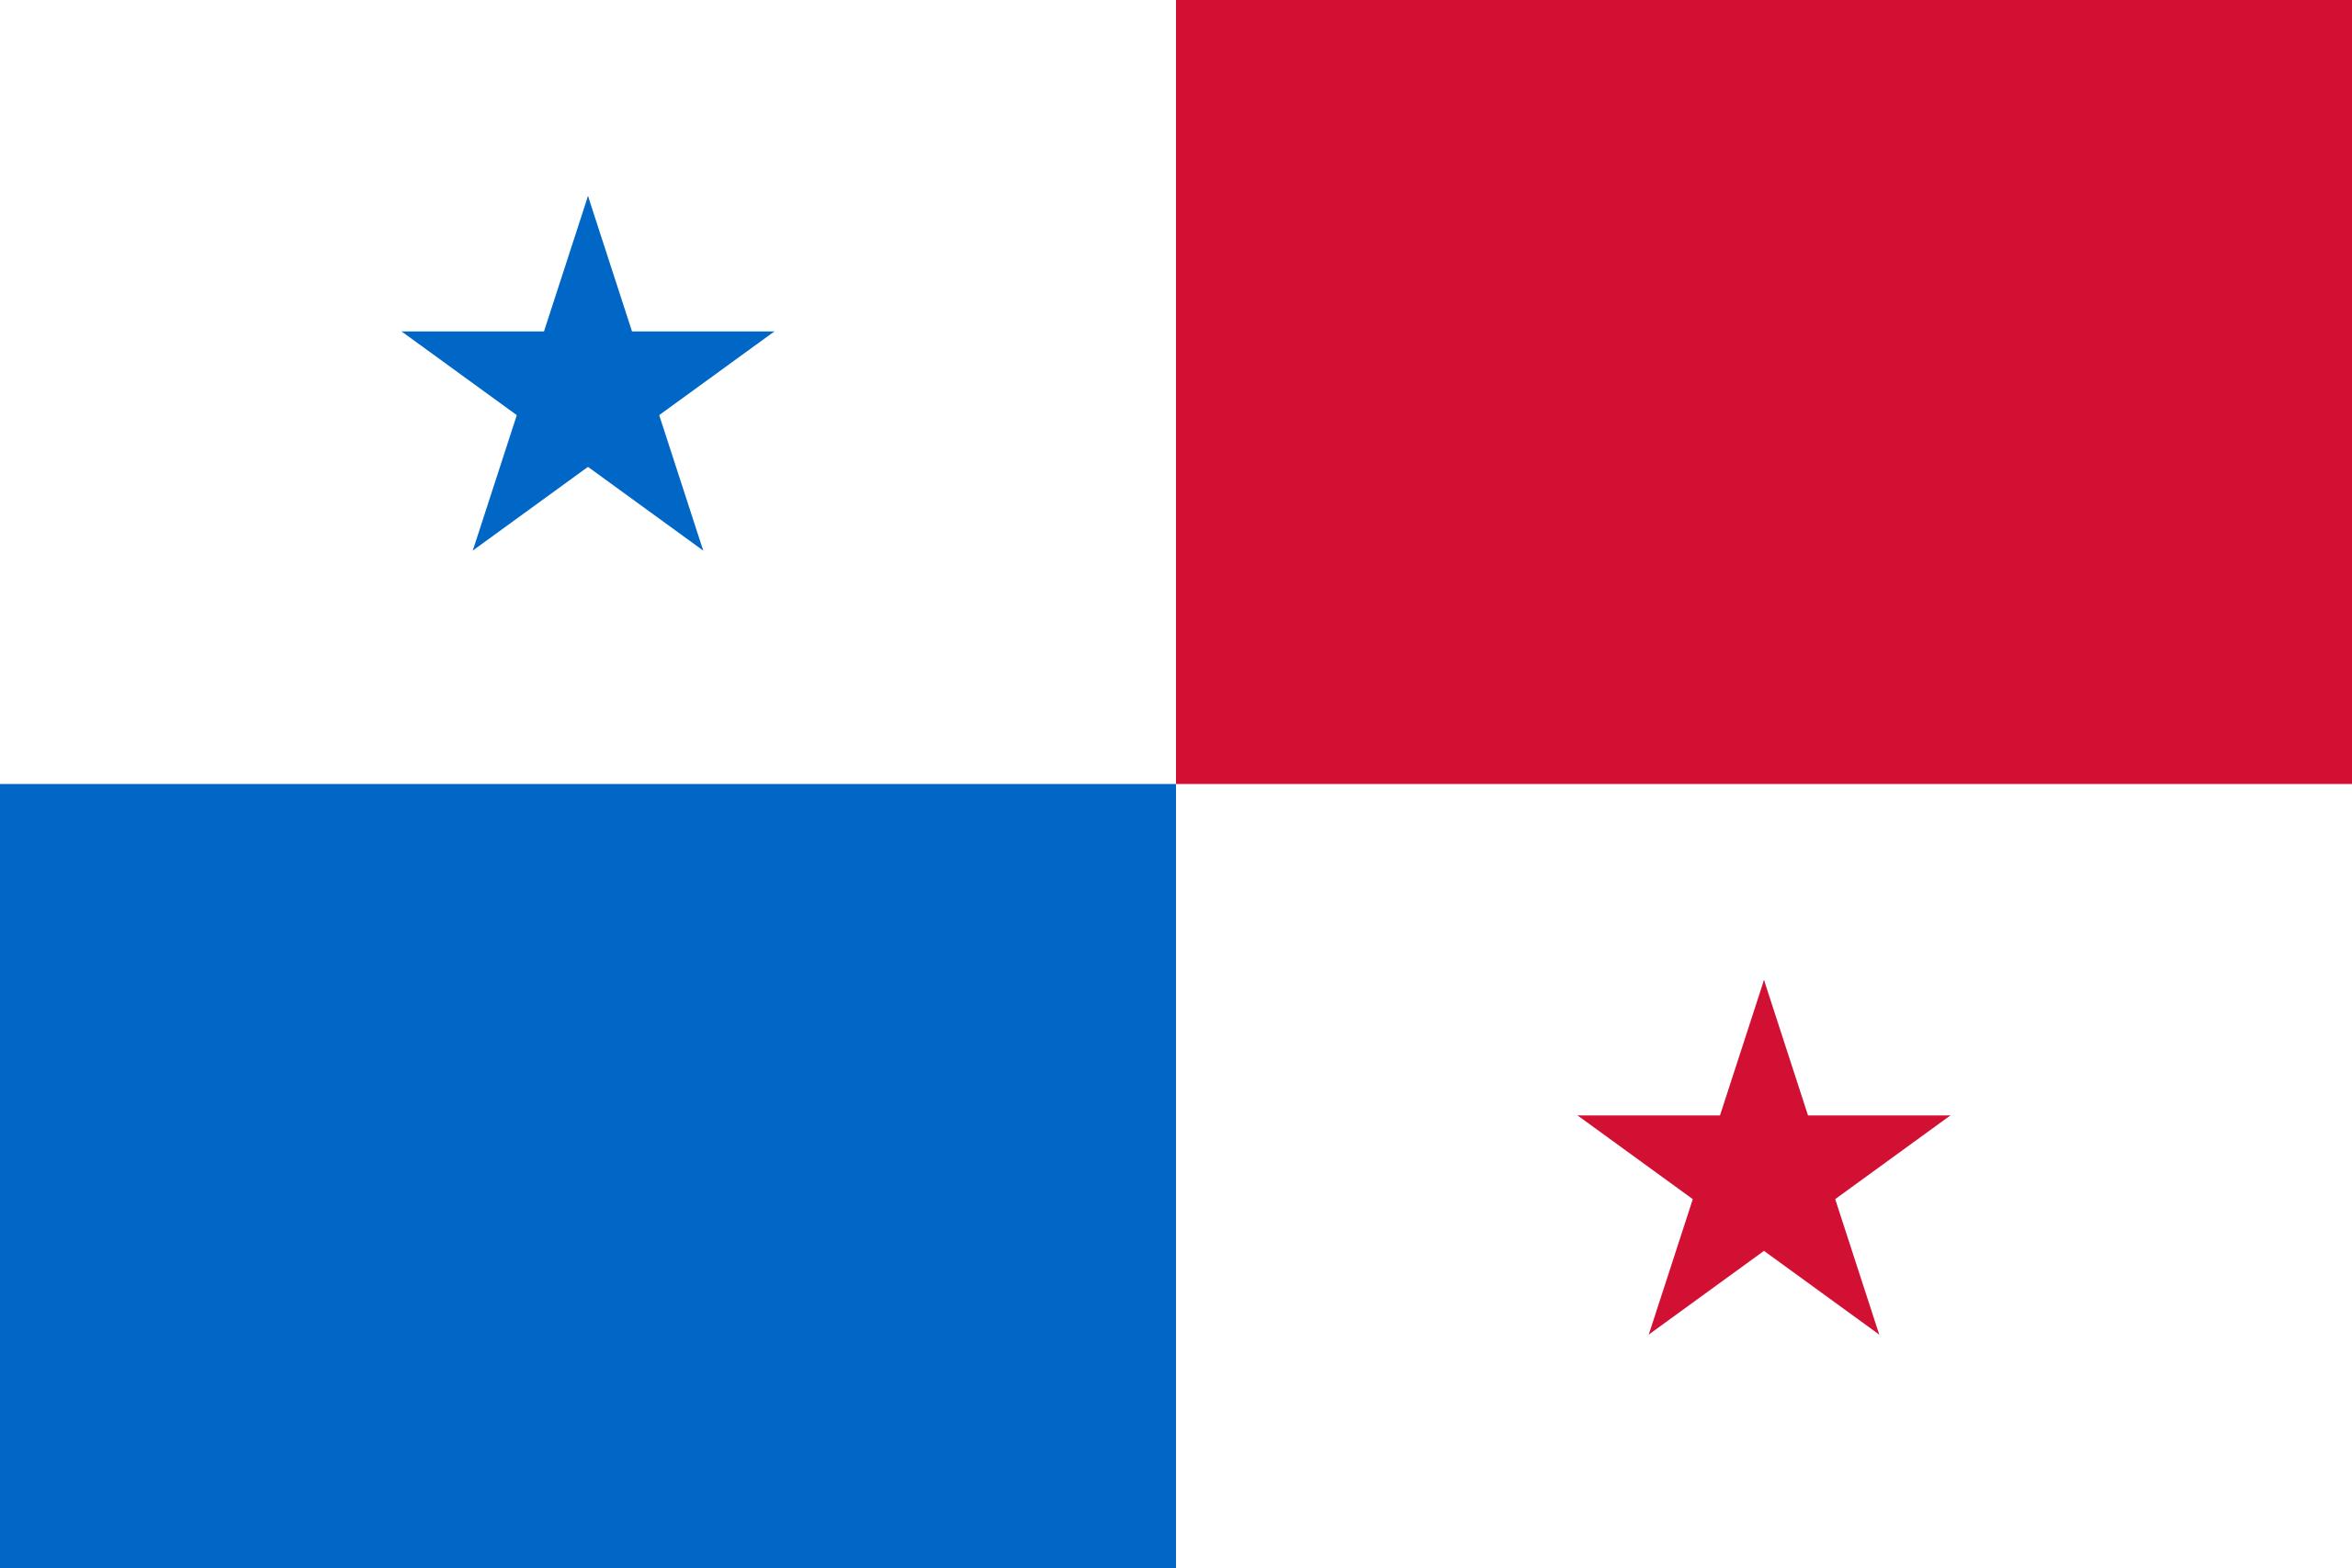 Панама, страна, Эмблема, логотип, символ - Обои HD - Профессор falken.com